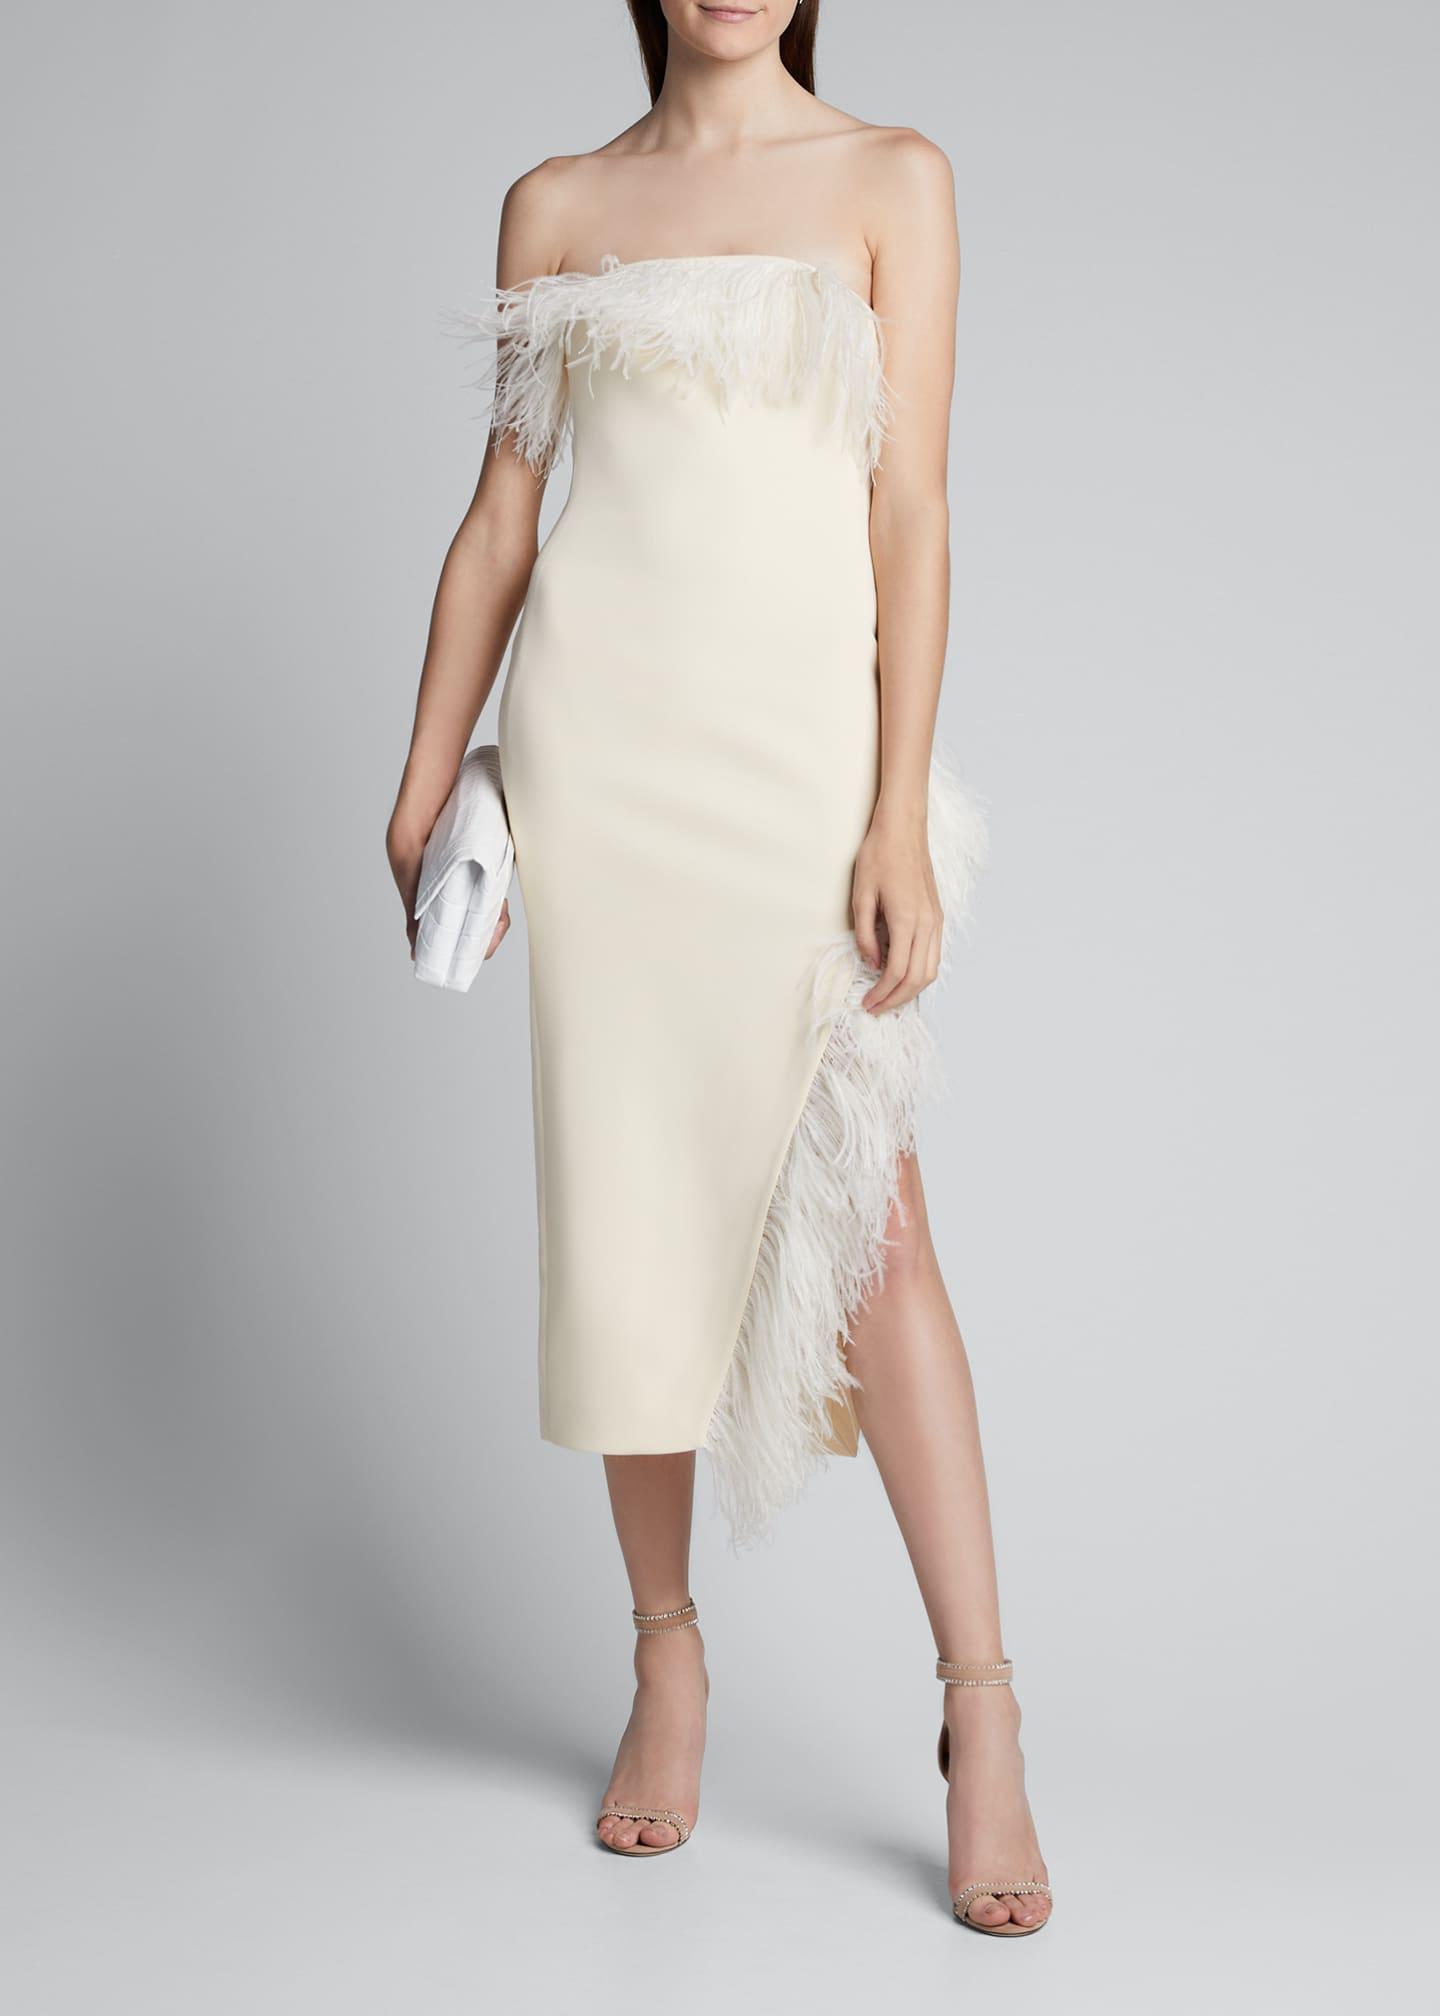 David Koma Strapless Feather-Trim Asymmetric-Hem Dress